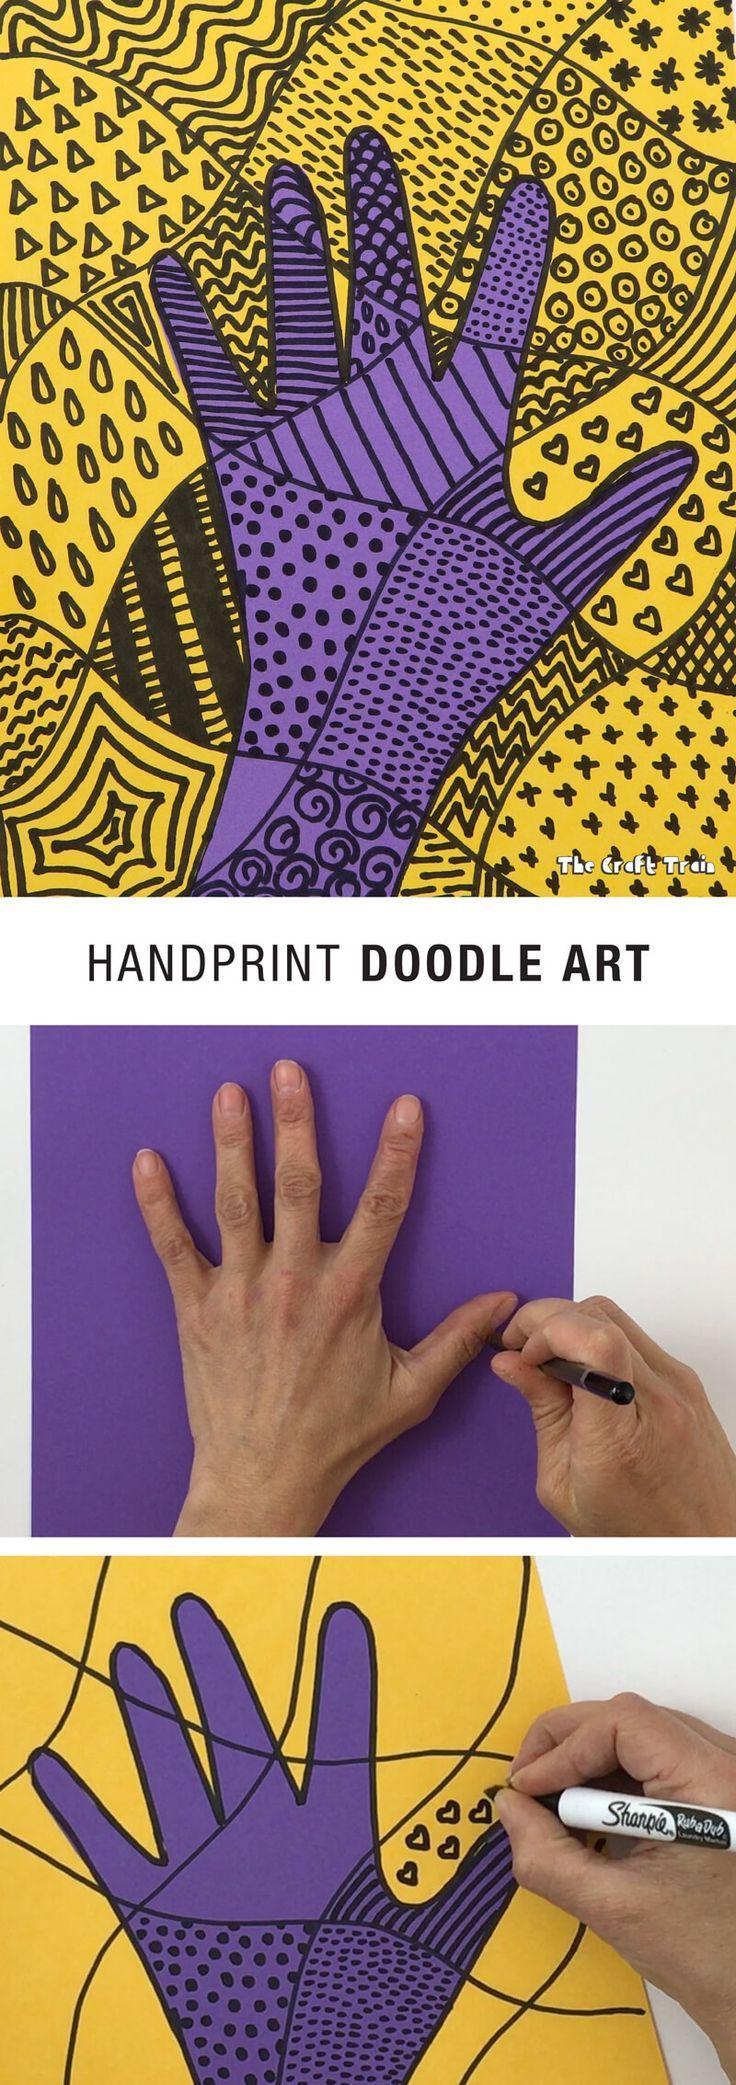 Handprint doodle art for kids. Fun art activity!